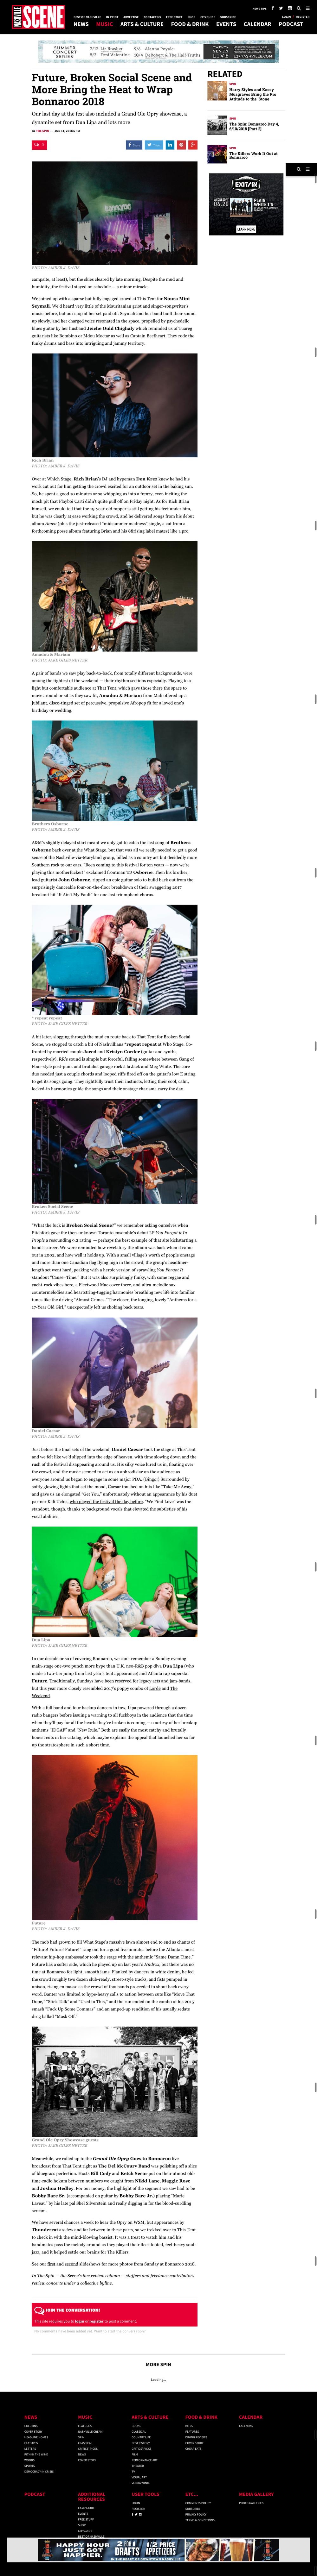 Nashville Scene - Future  Broken Social Scene and More Bring the Heat to Wrap Bonnaroo 2018.png